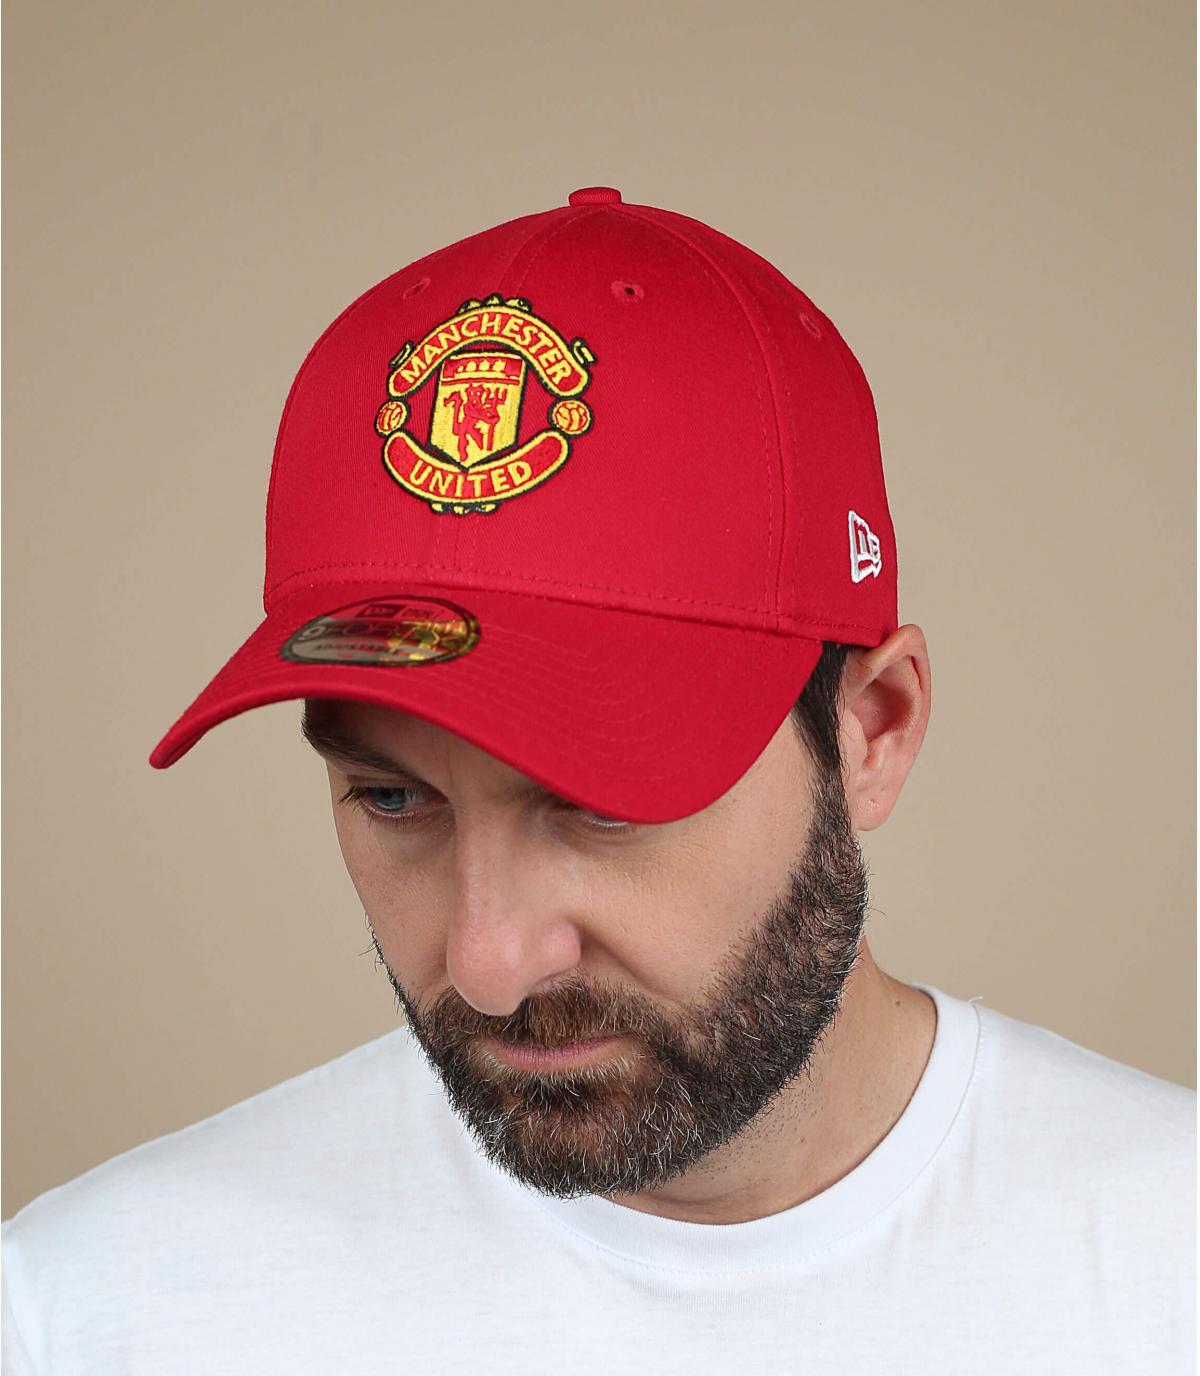 Gorra roja del Manchester United